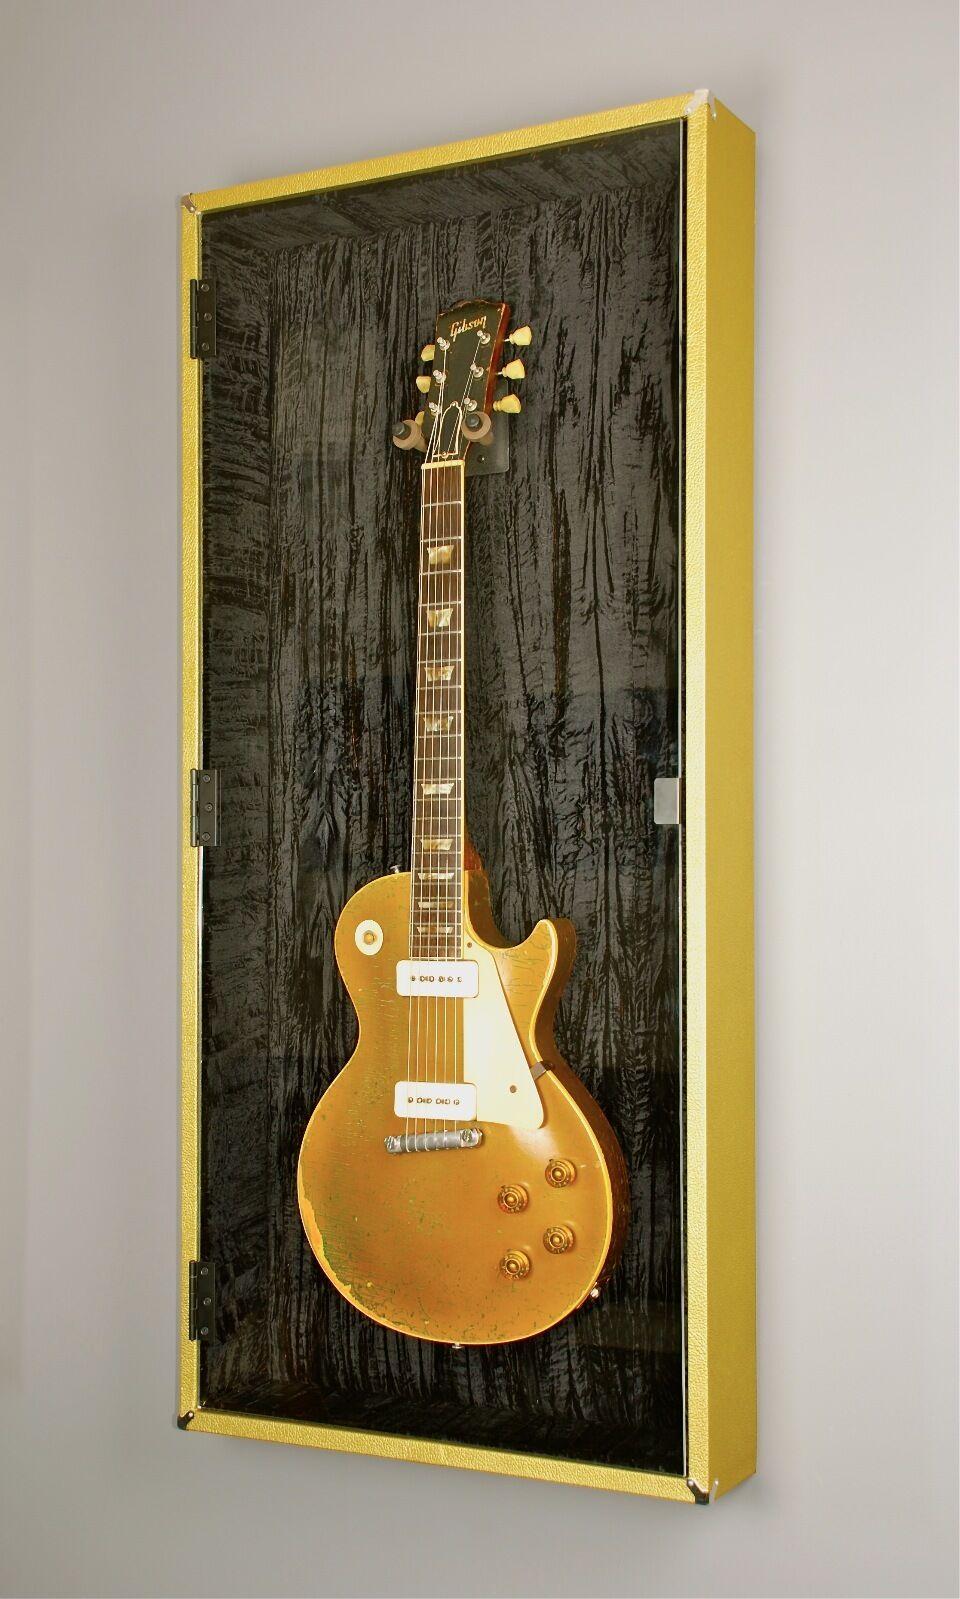 Gold Tolex Guitar Display Case Cabinet